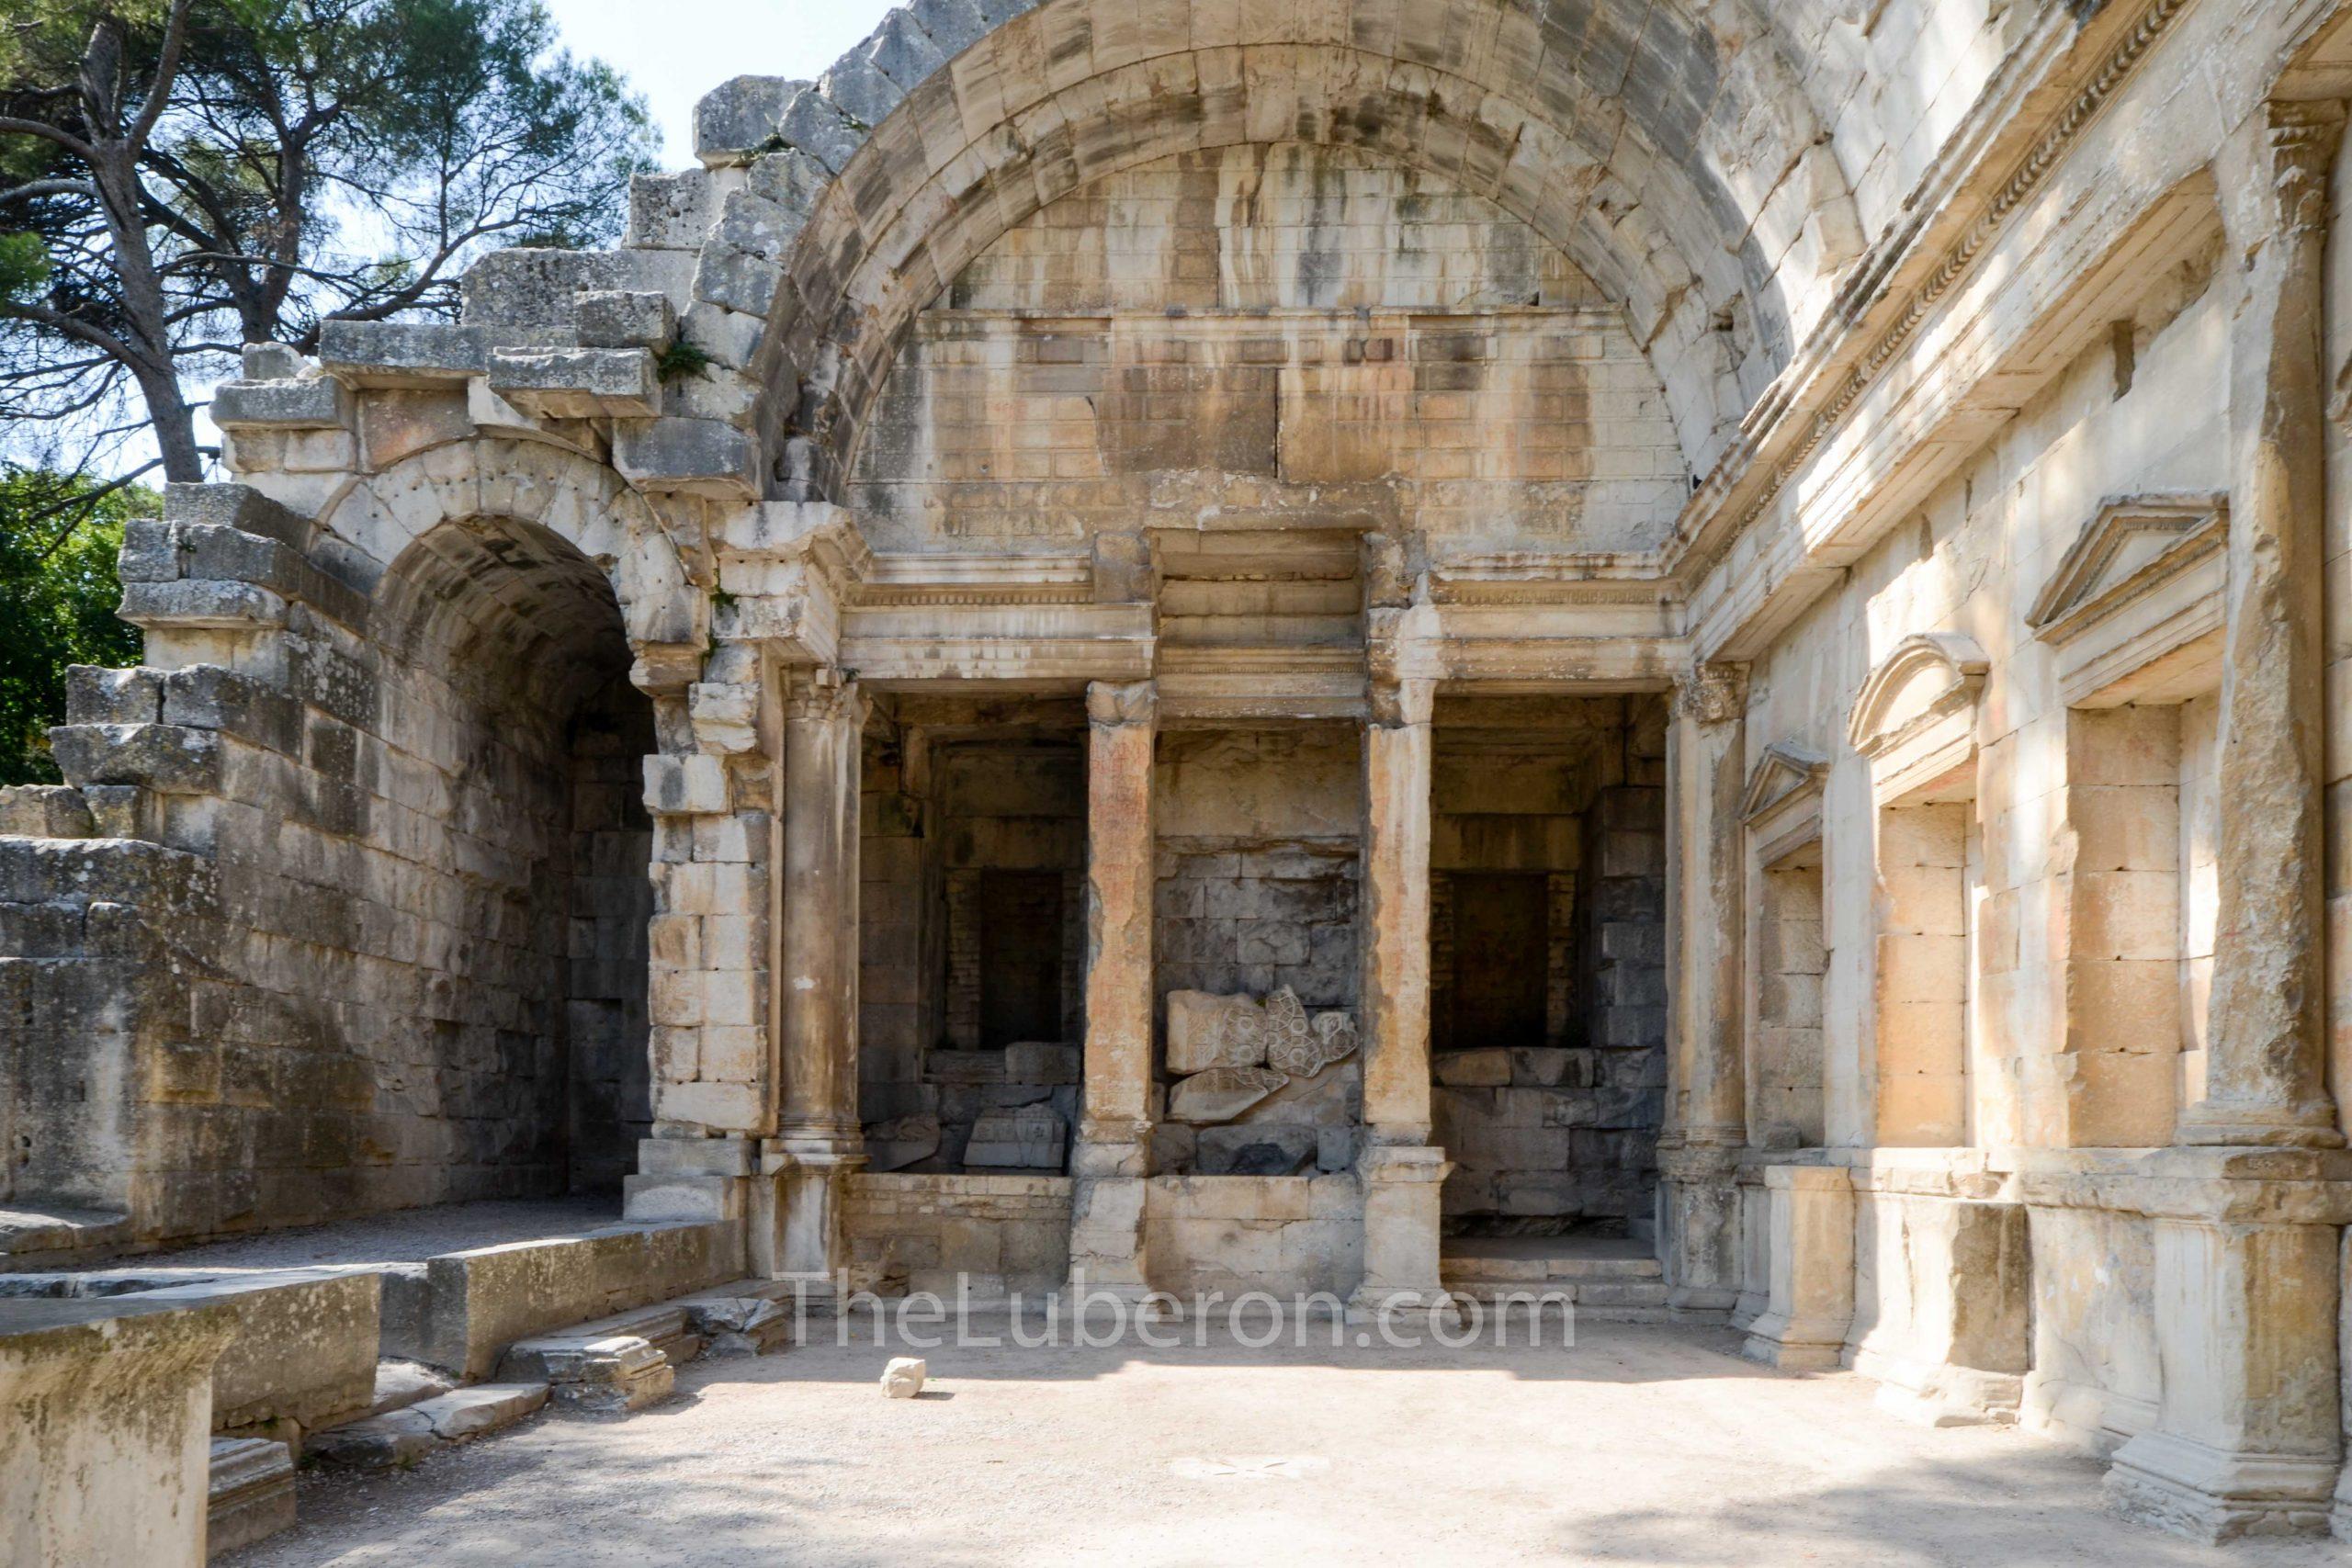 Temple o f Diana detail, Nimes